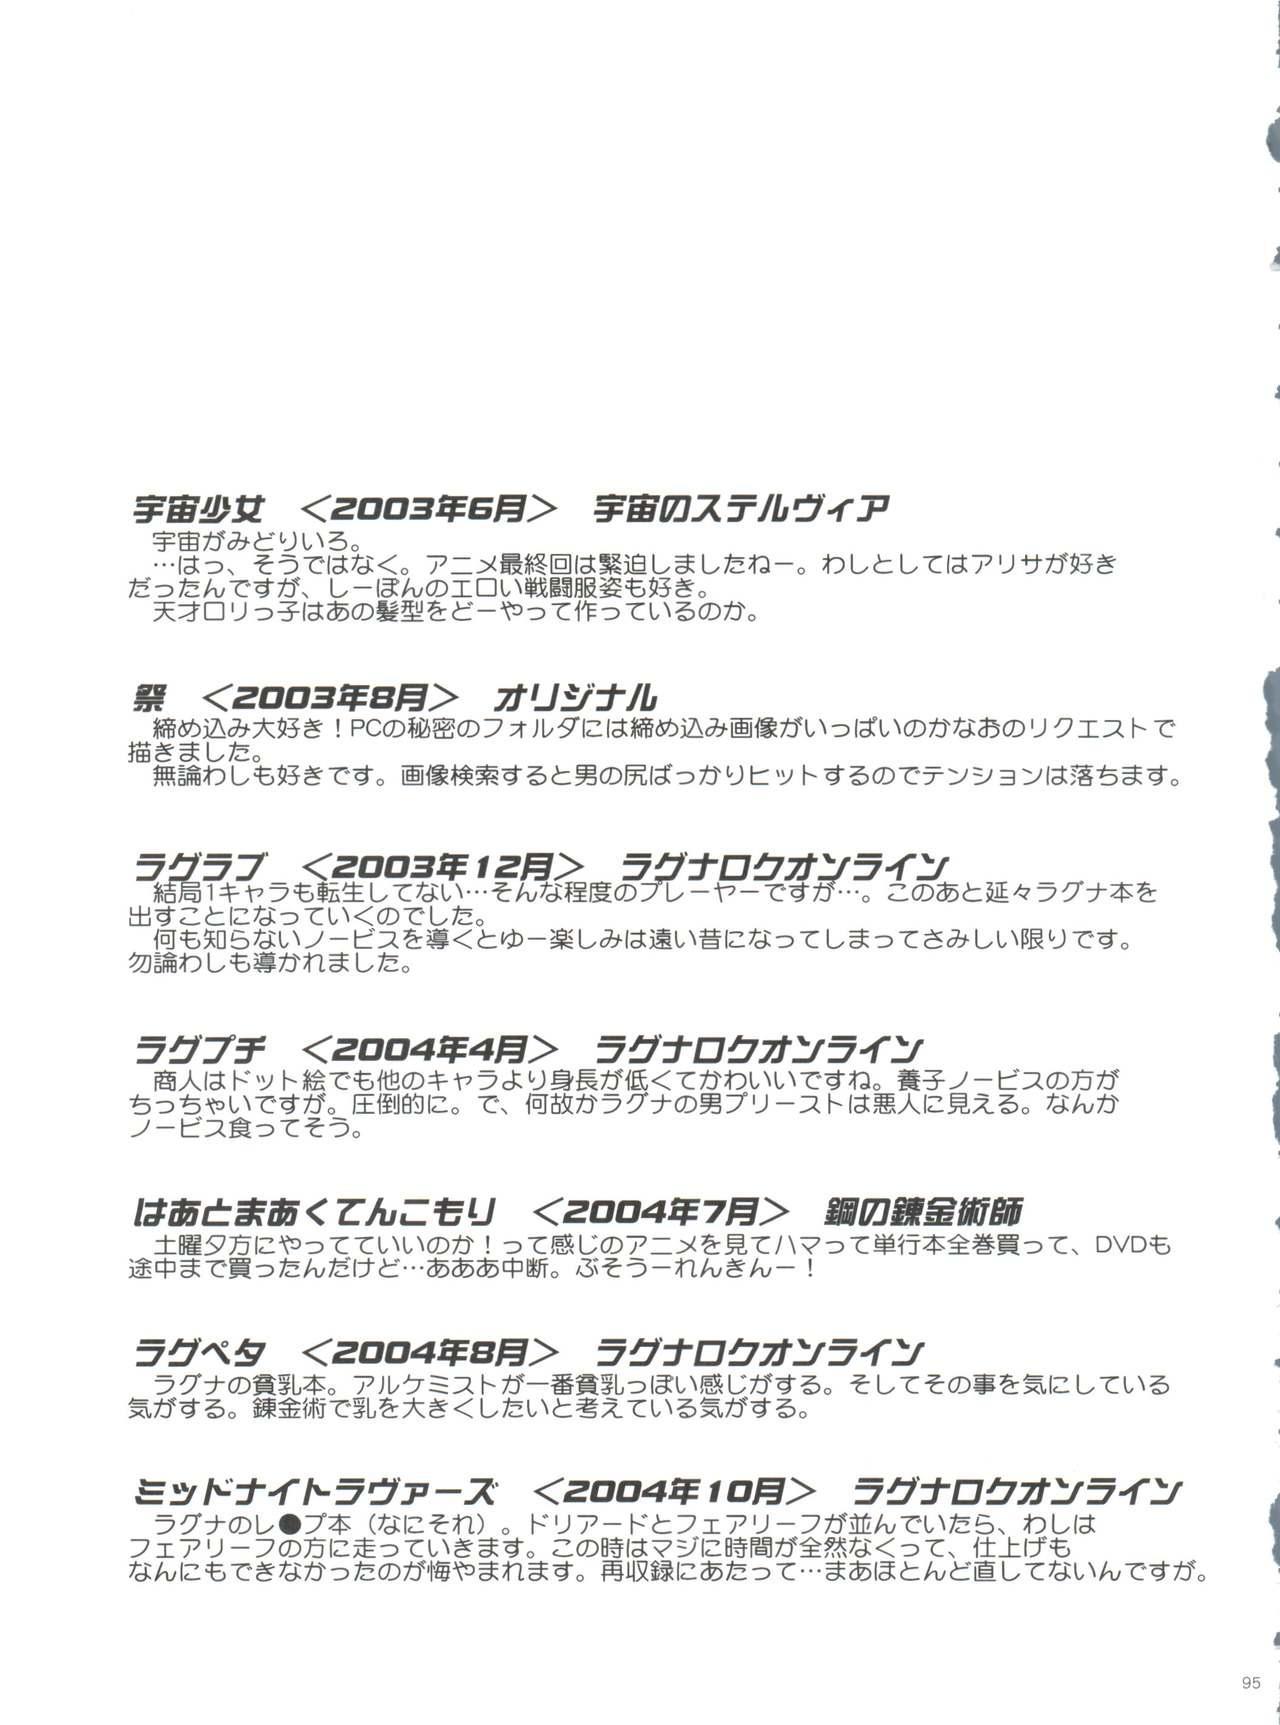 21 Seikihan Part 1 94